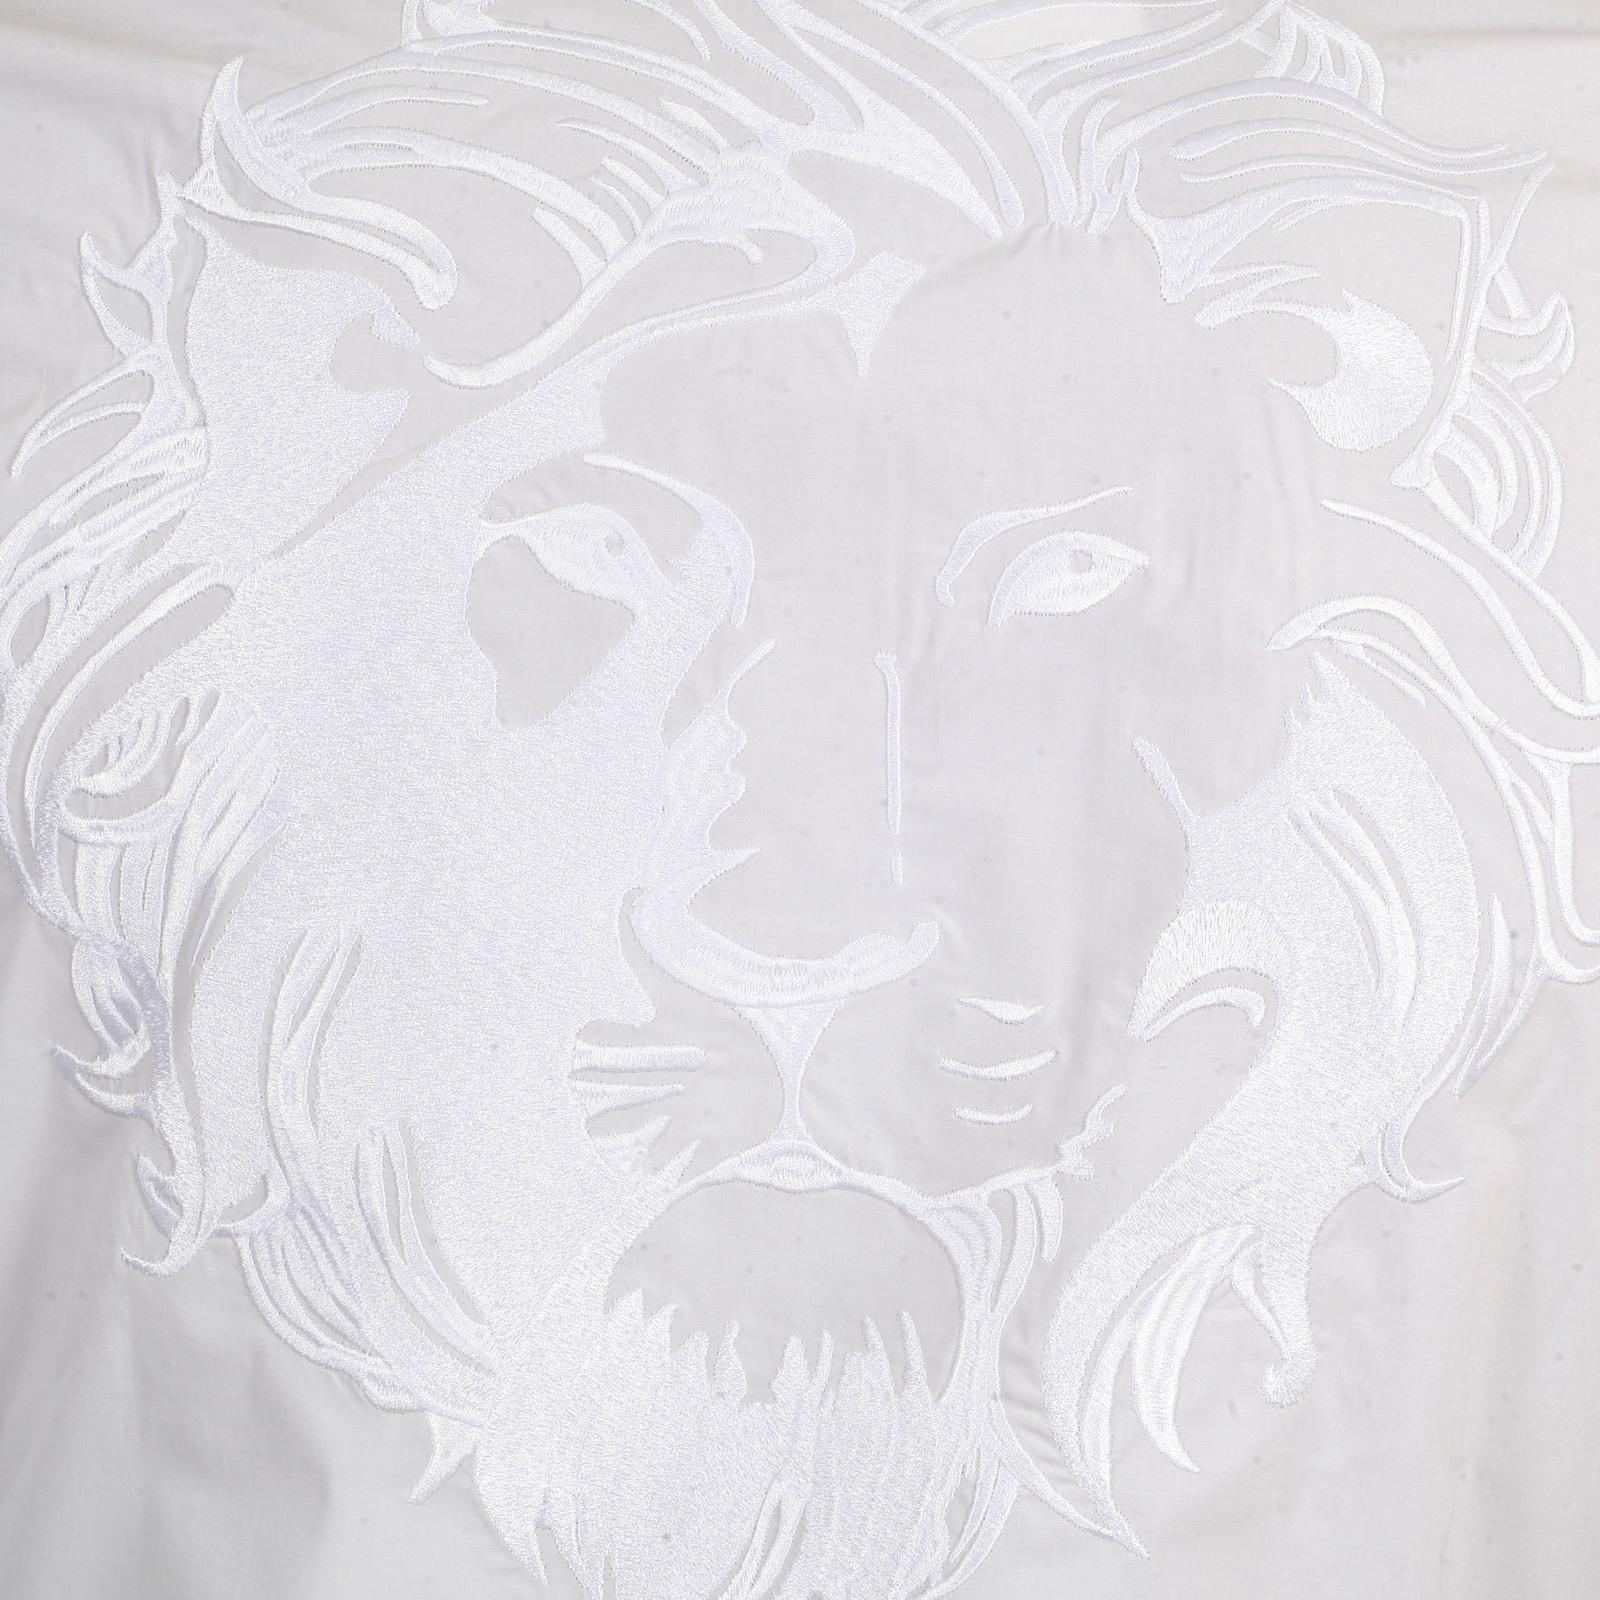 Soft Collar Embroidered Lion Head On Back Slimmer Fit